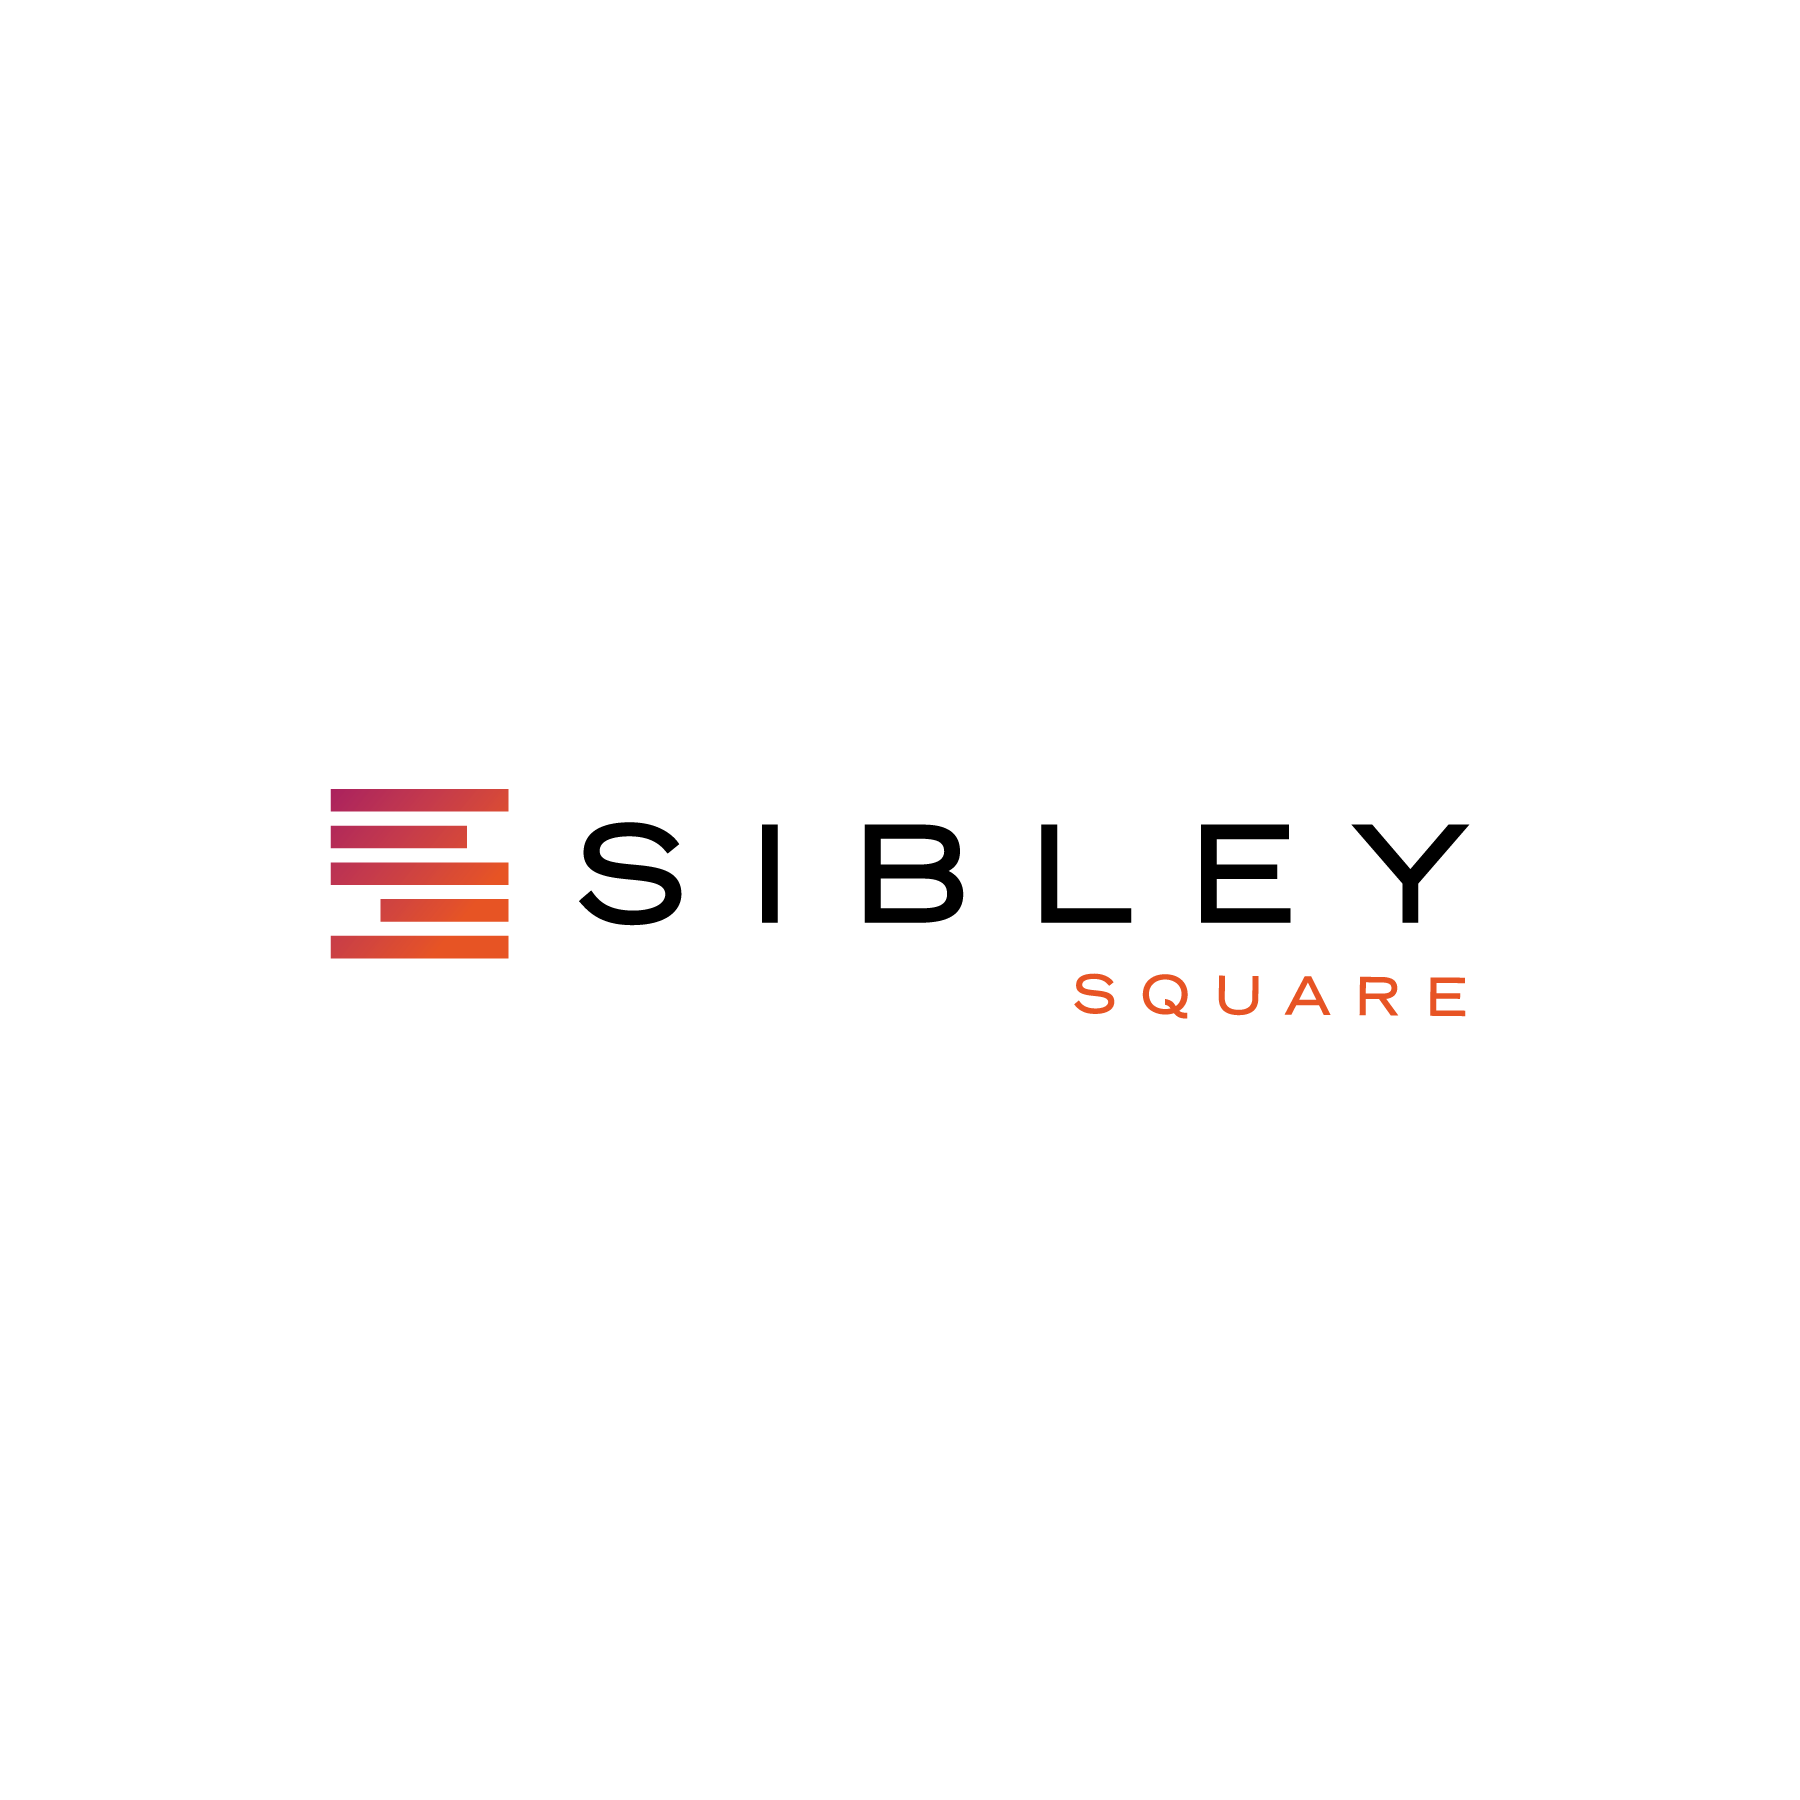 Sibley Square